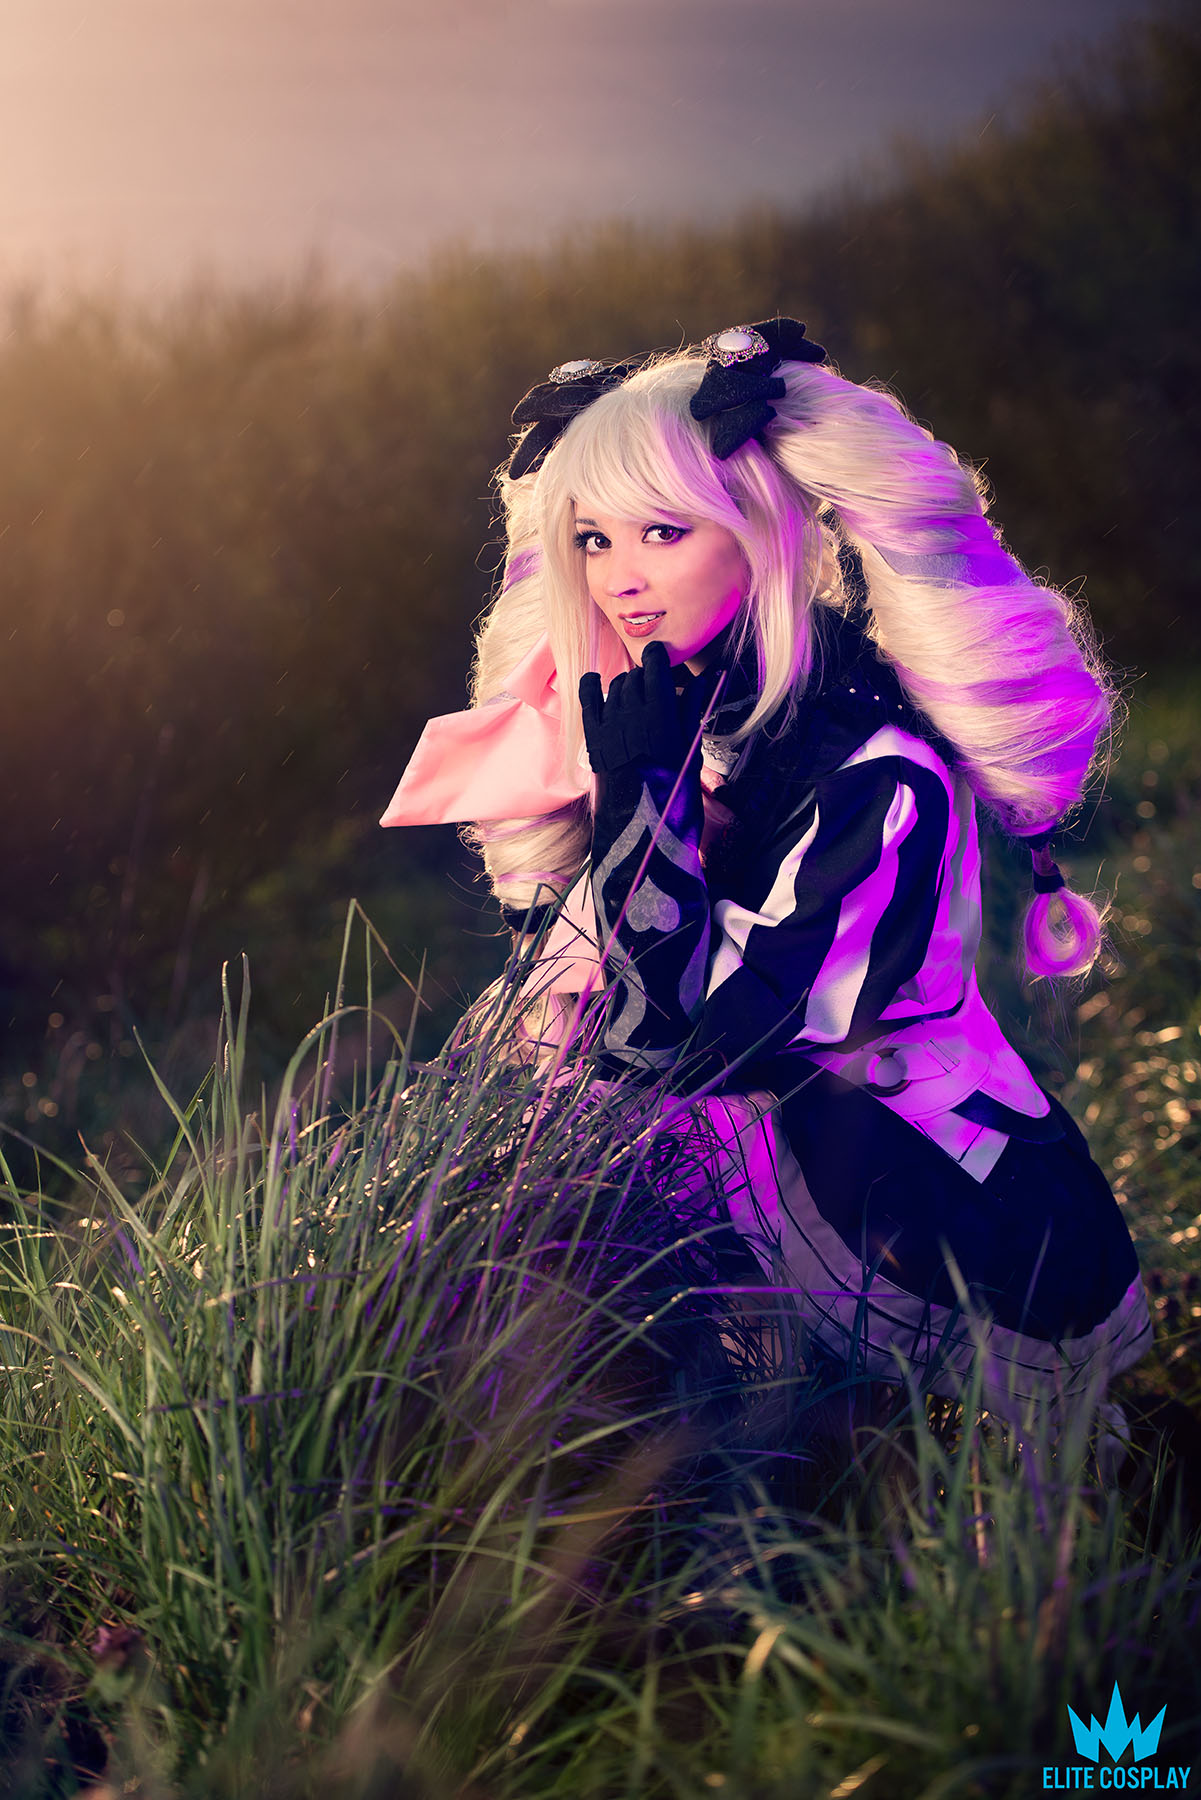 Elise Cosplay Photoshoot (Sakura-Con 2016) - Elite Cosplay